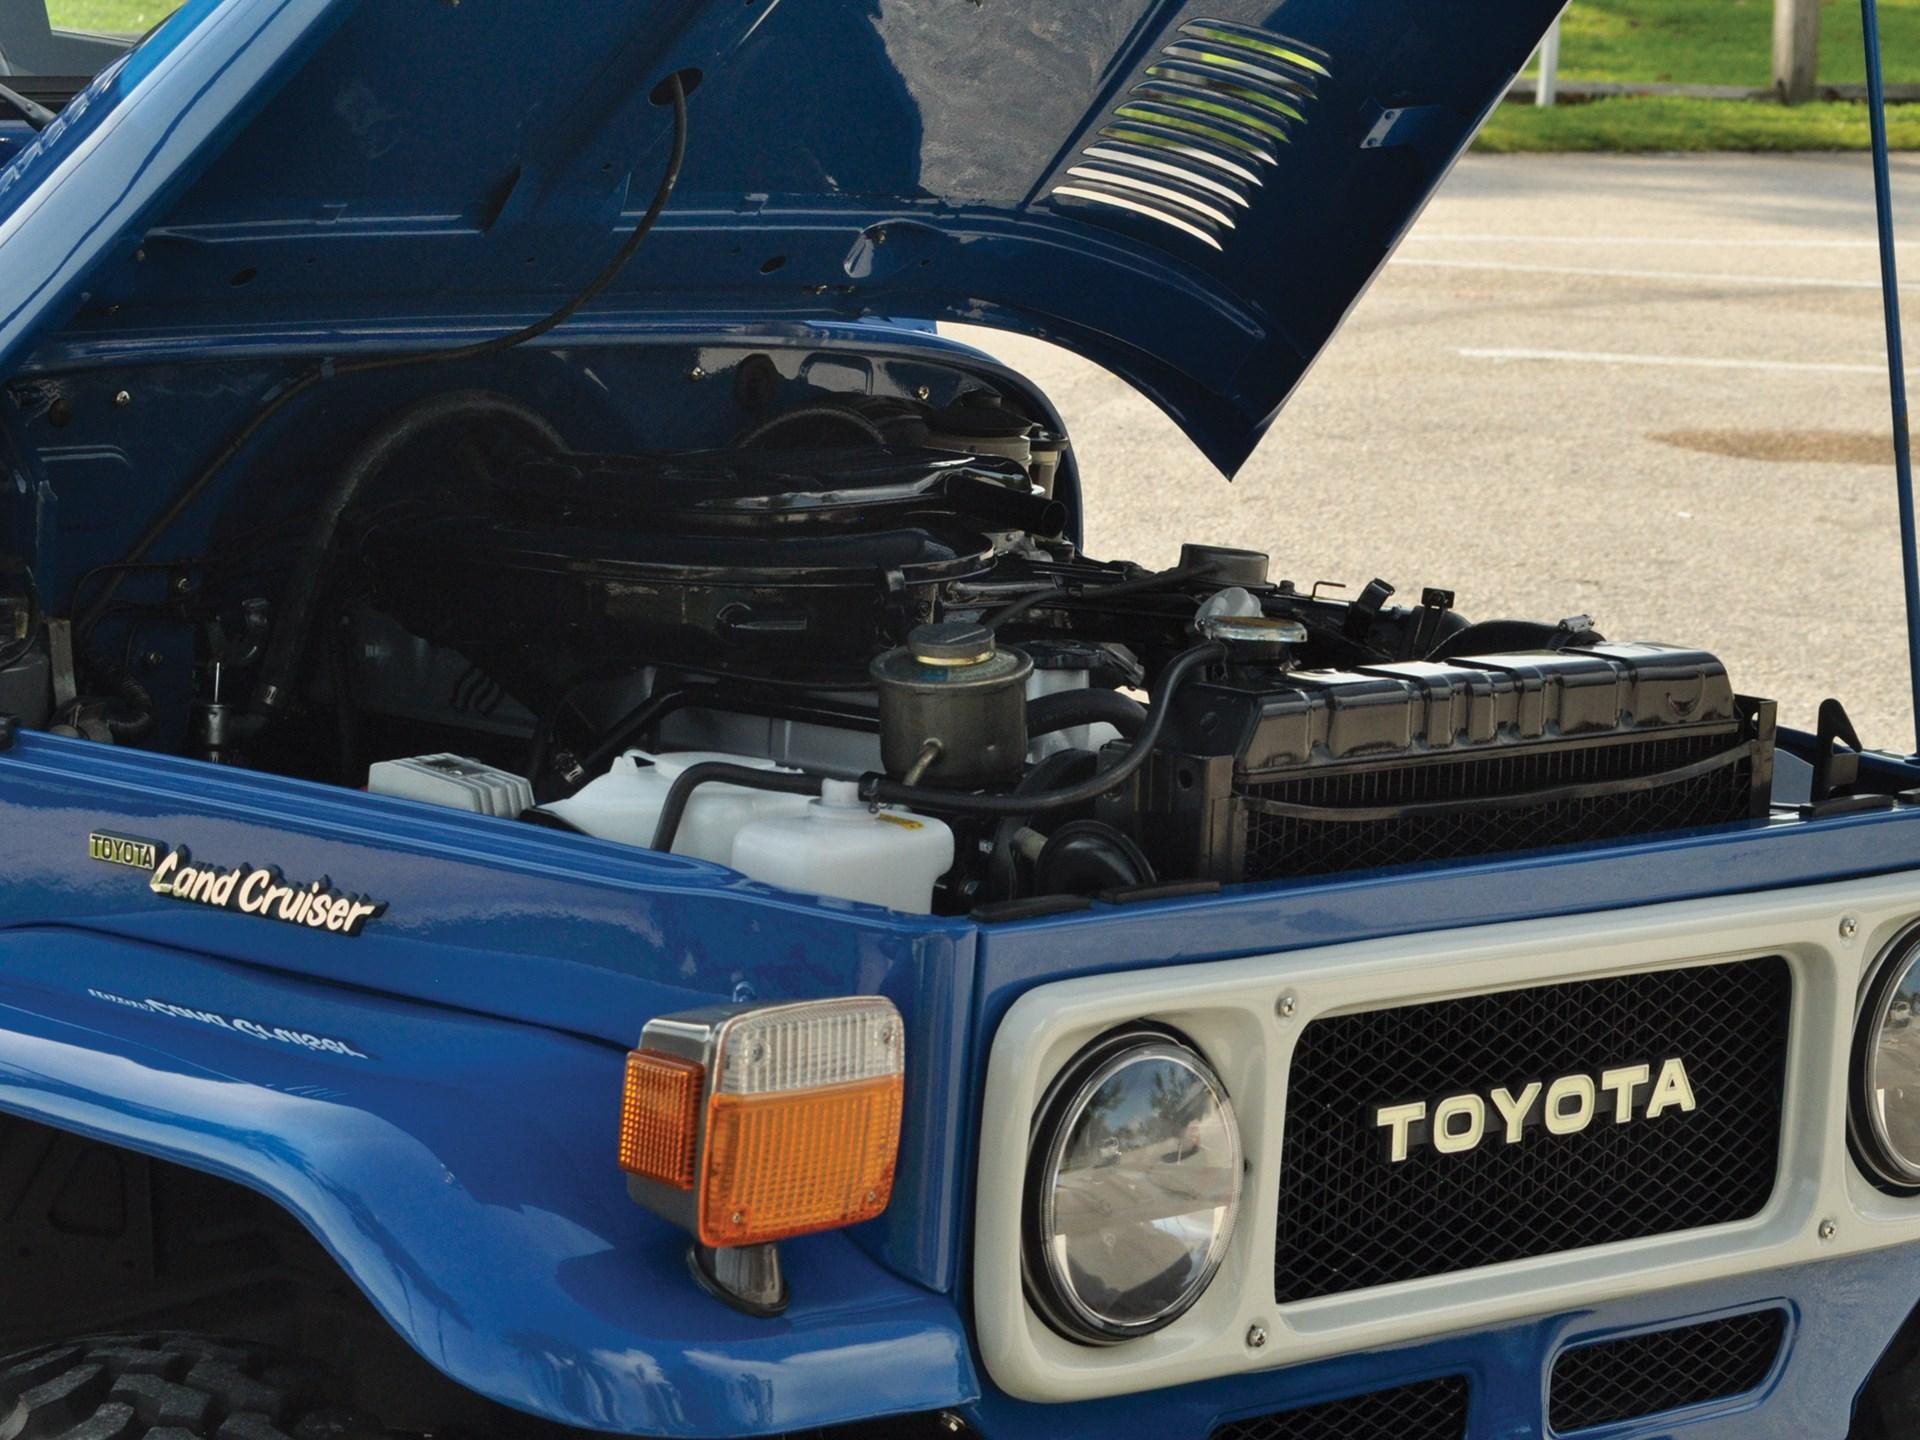 Rm Sothebys 1982 Toyota Fj40 Land Cruiser Hershey 2018 1960s Options